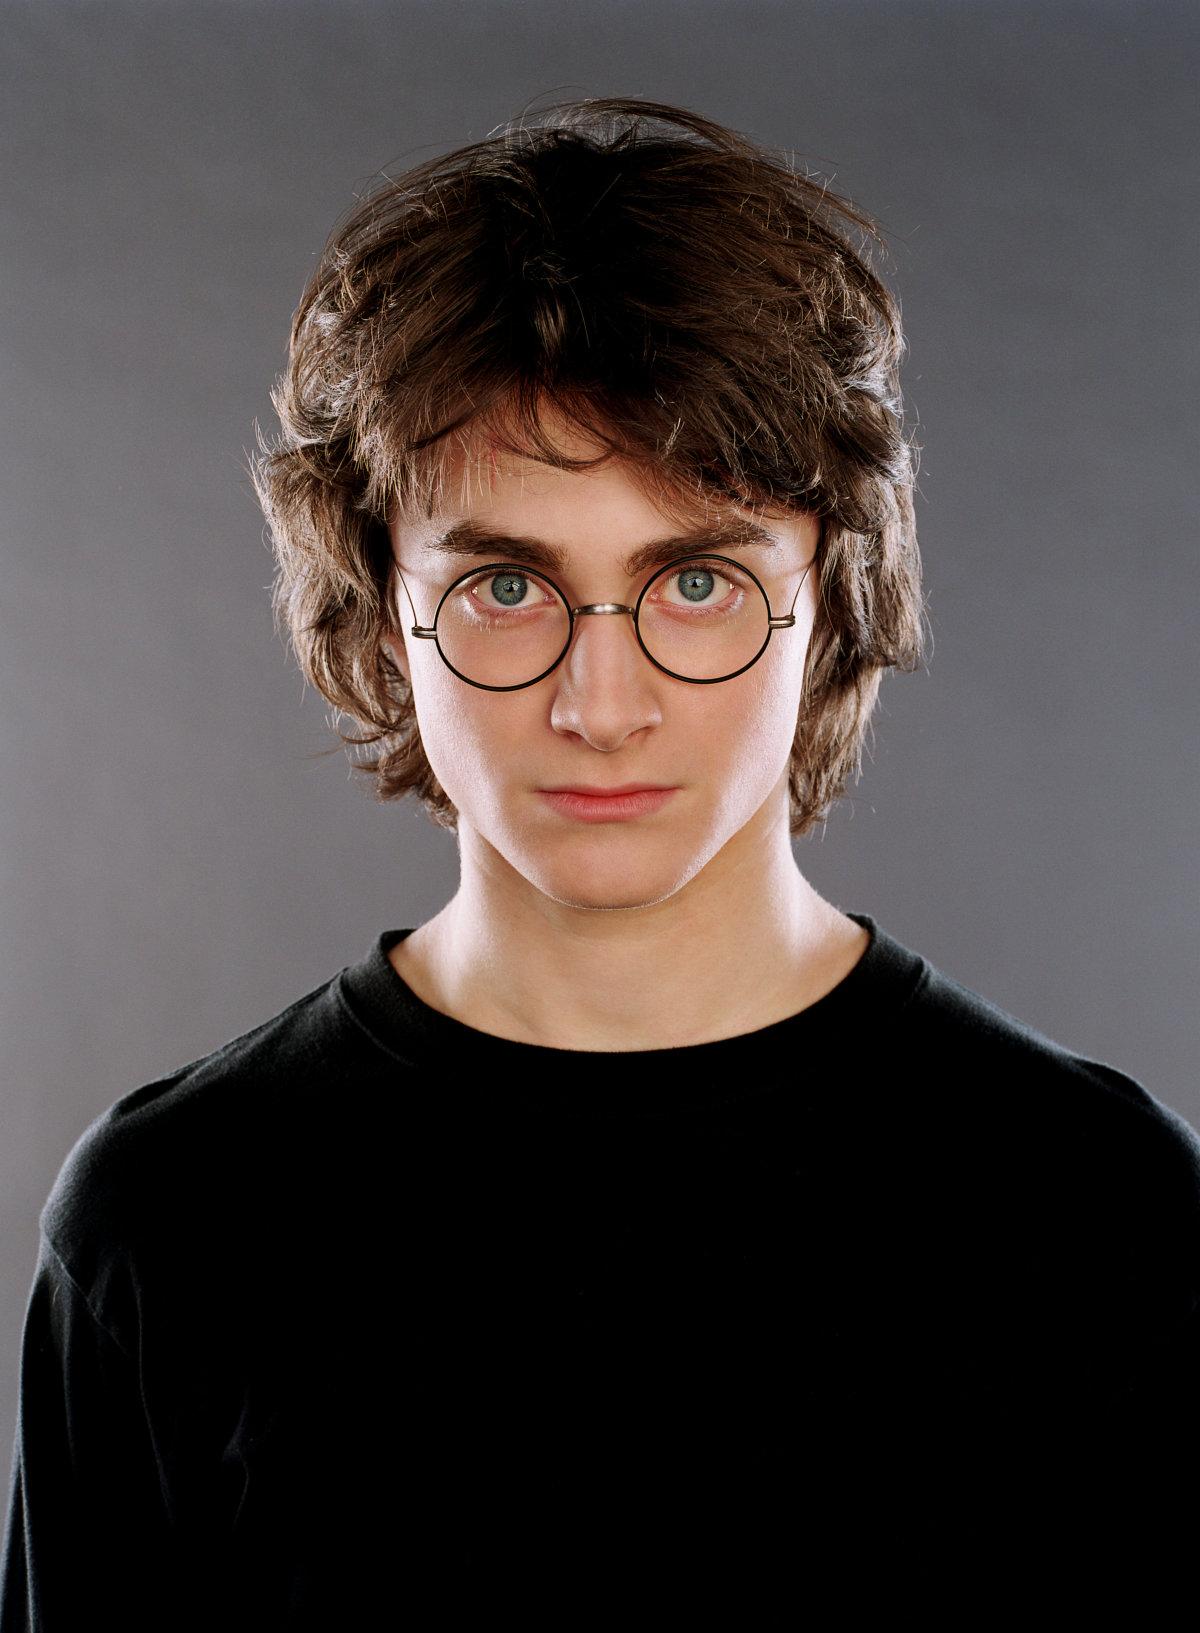 Harry Potter - Pottermore